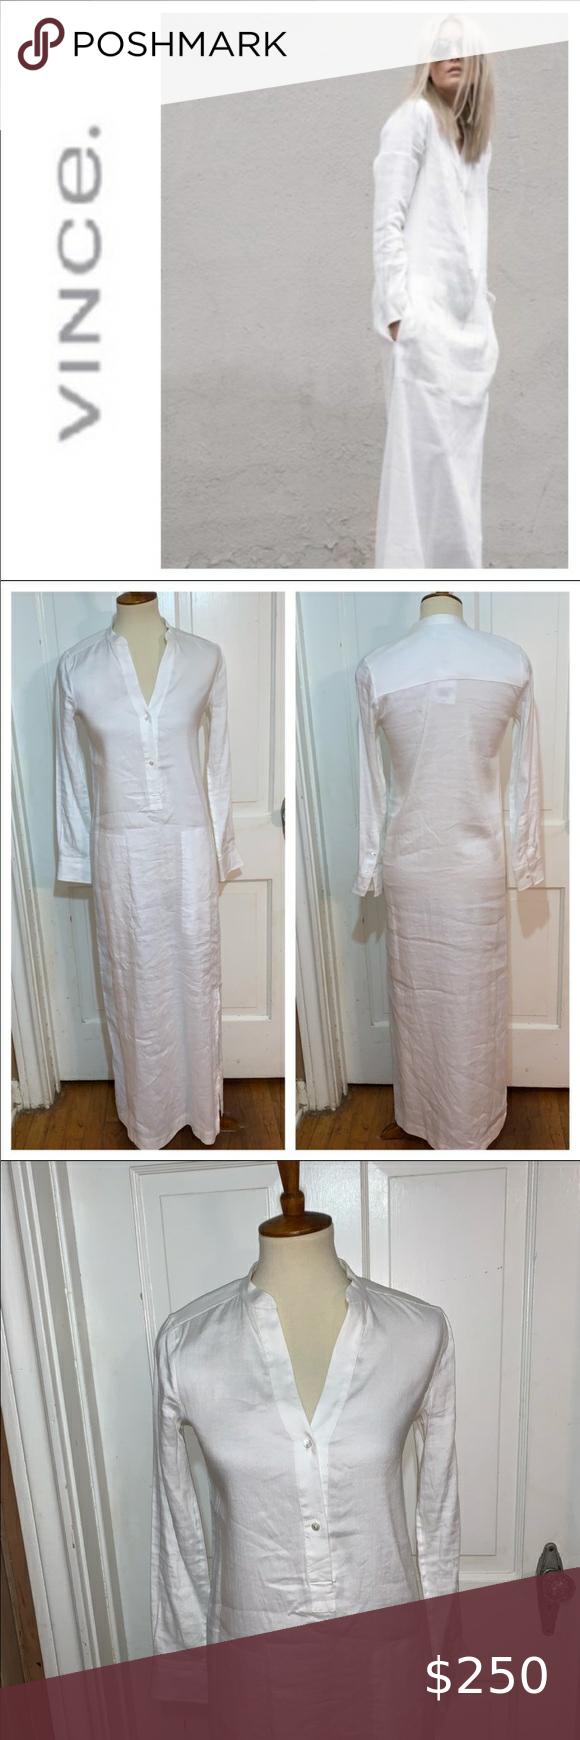 Nwt Vince White Linen Maxi Dress Caftan Size 00 Linen Maxi Dress White Linen Maxi Dress Caftan Dress [ 1740 x 580 Pixel ]